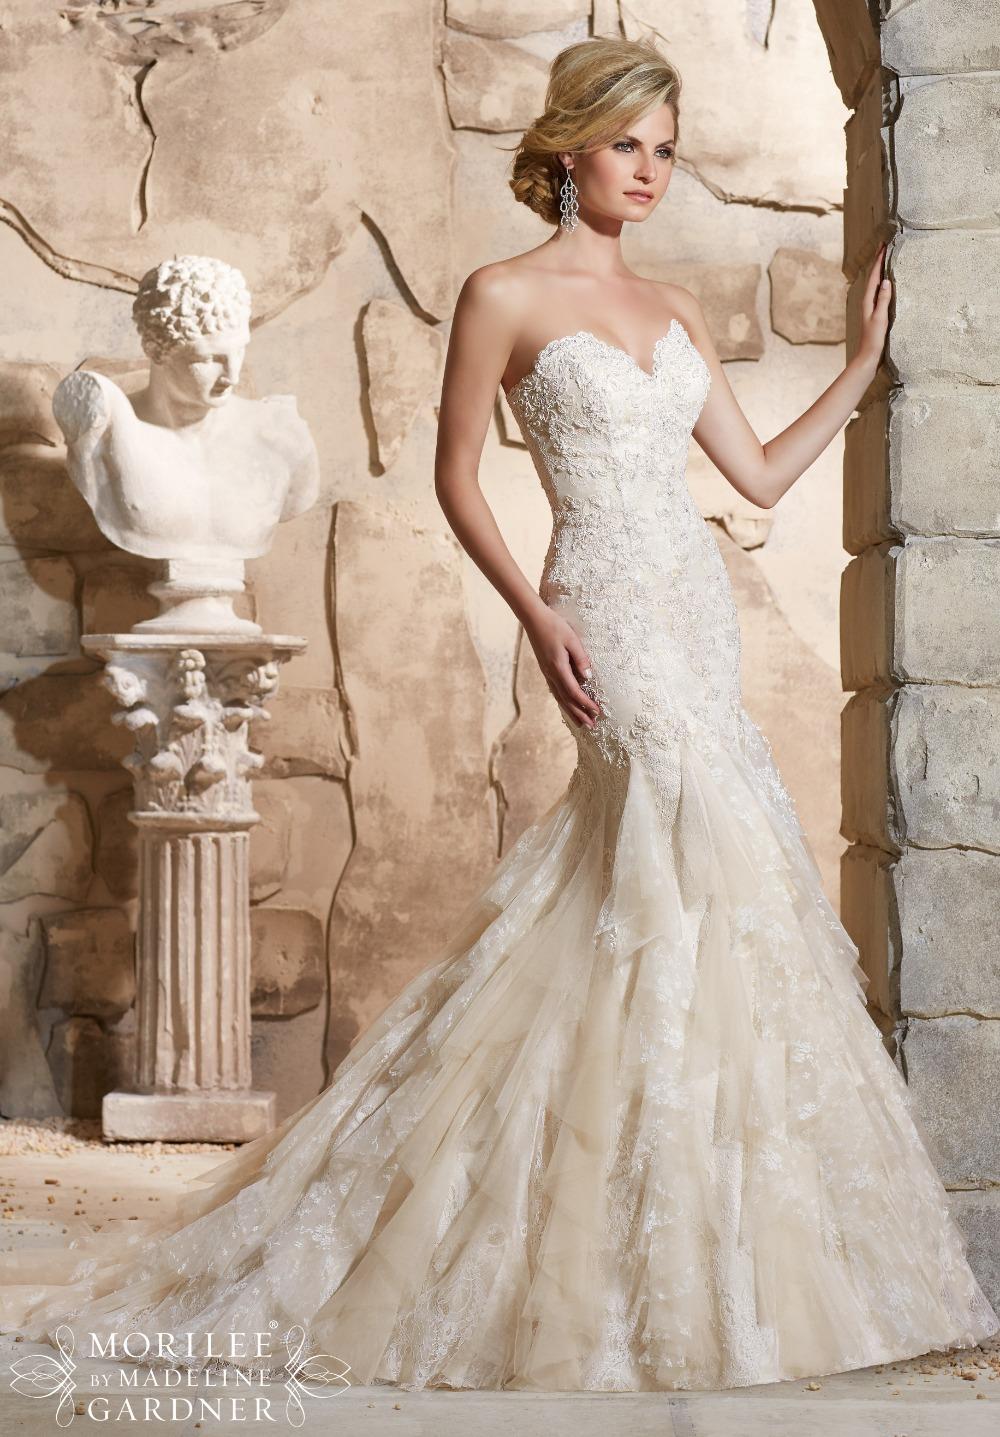 strapless sweetheart romantic mermaid wedding dress vintage mermaid wedding dresses sweetheart neckline vintage lace mermaid wedding dress strapless